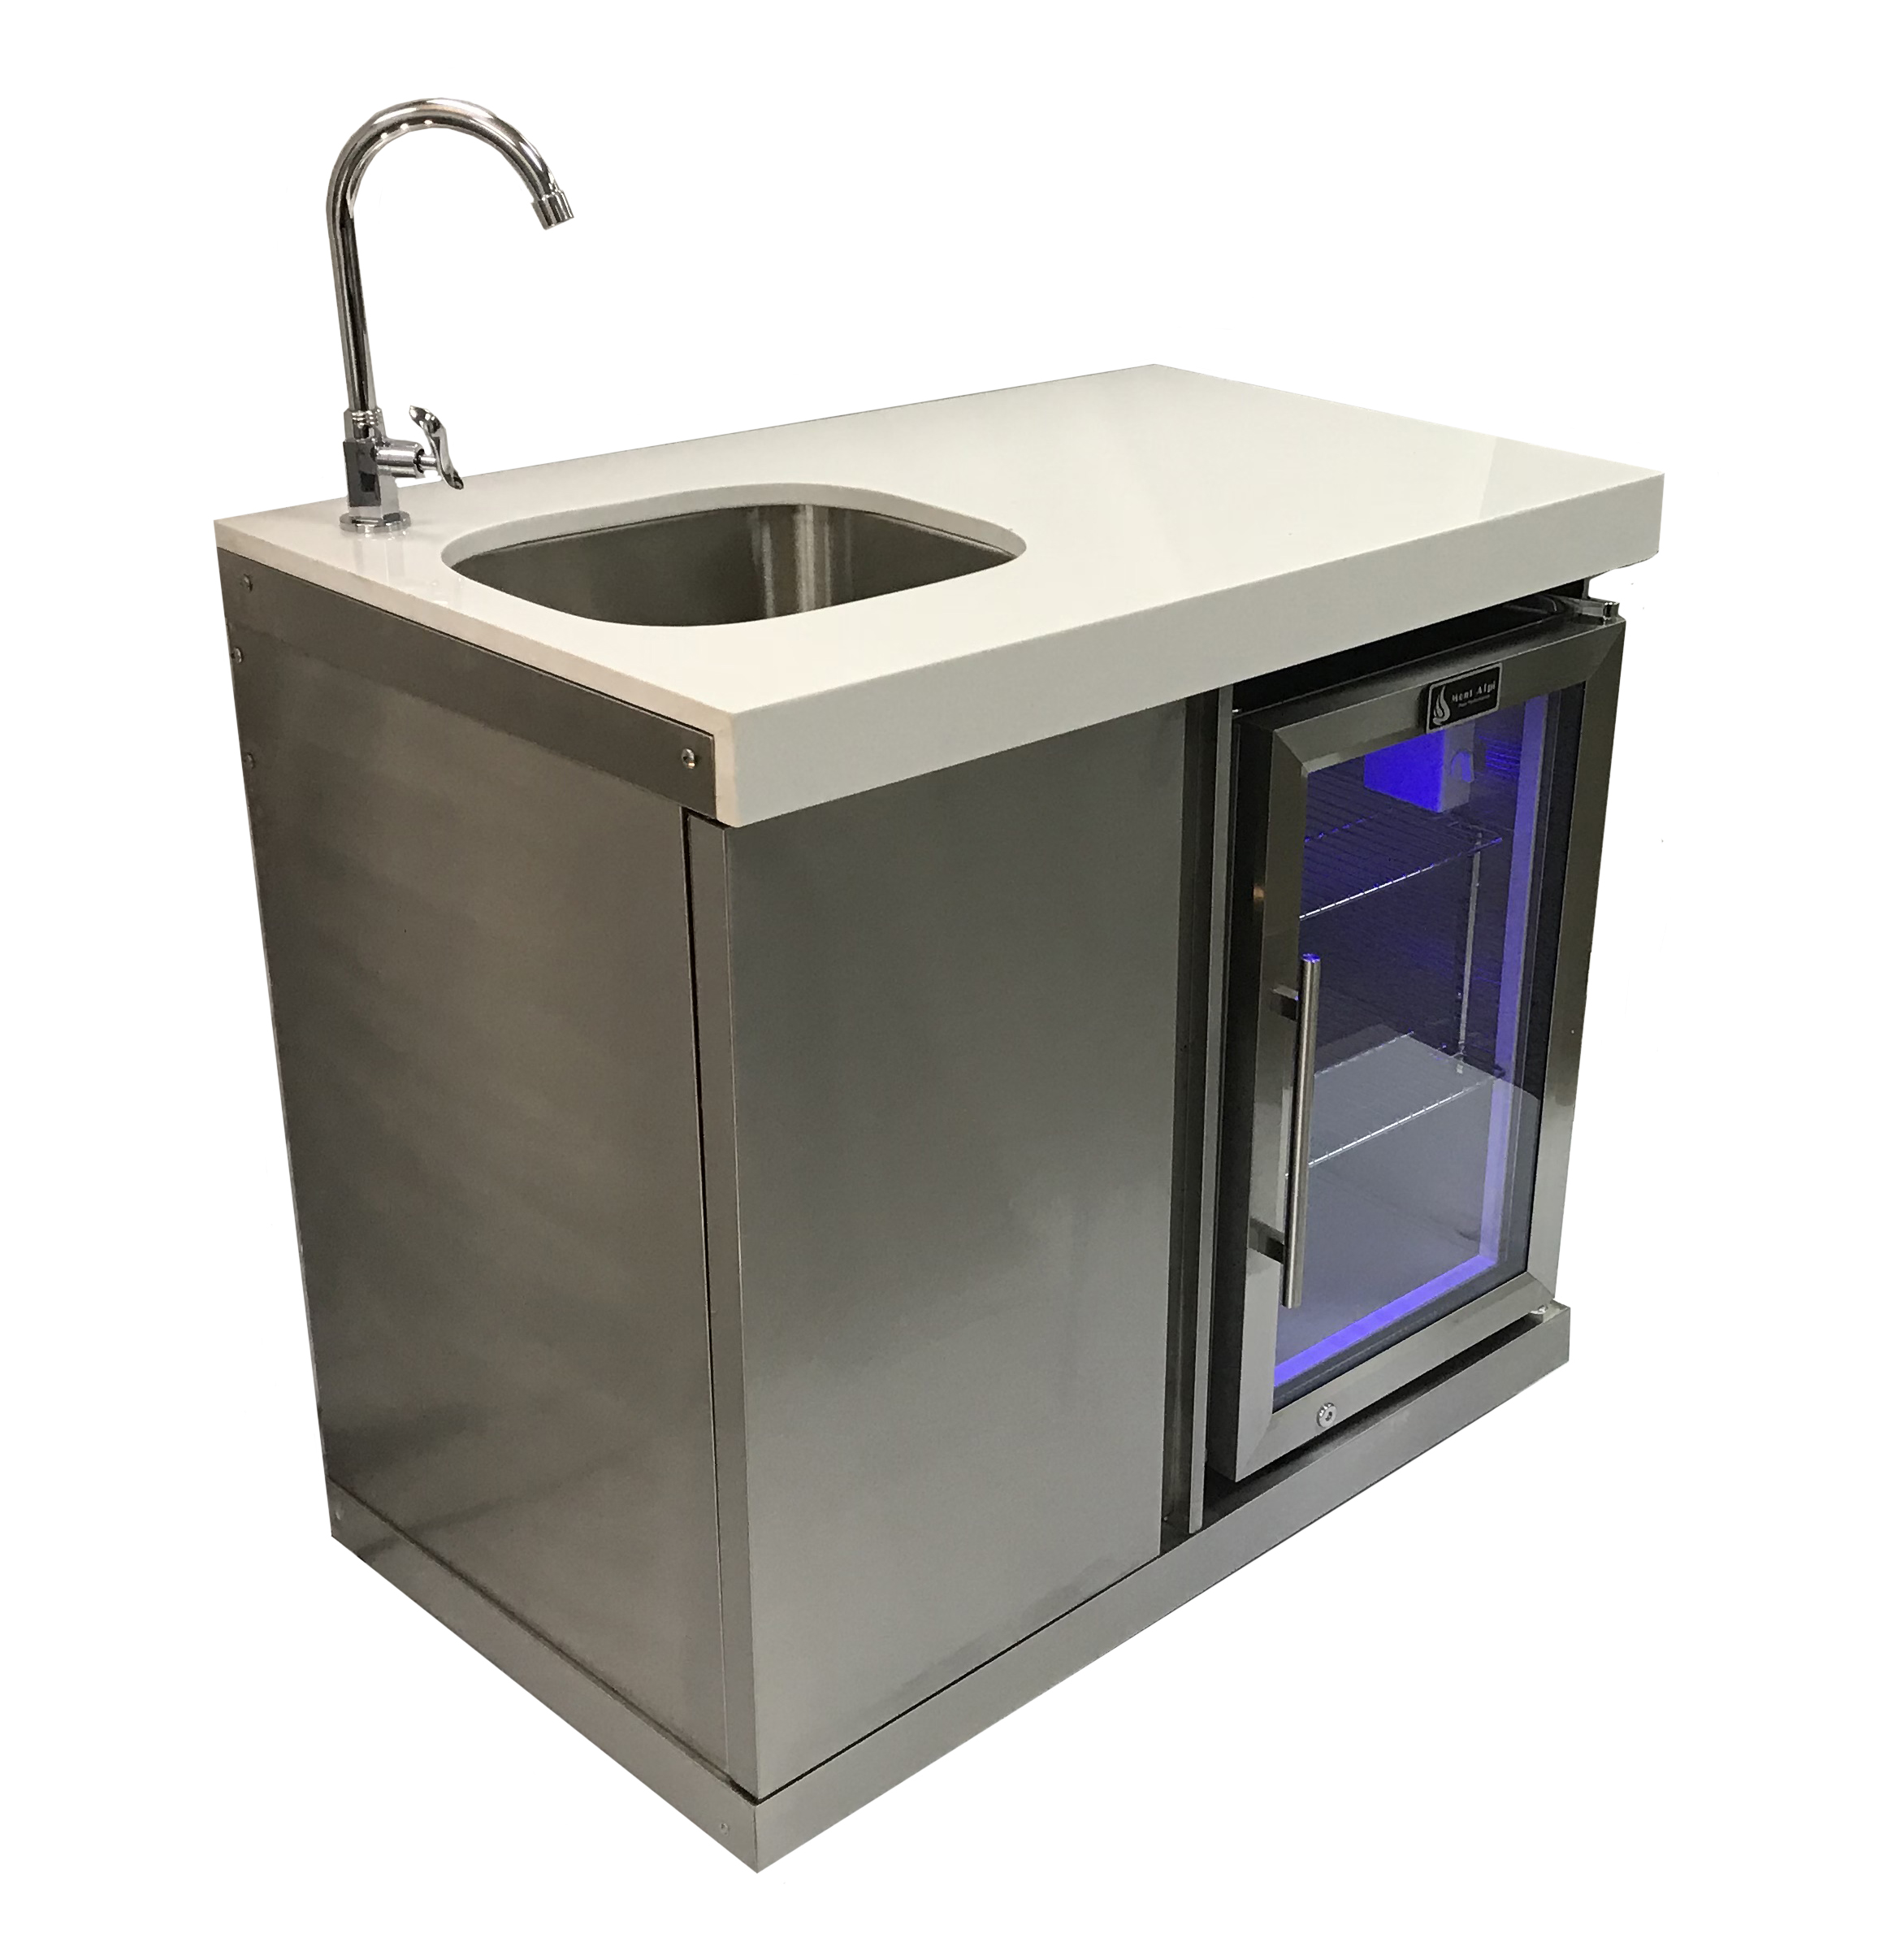 sink left angle jpeg.jpg